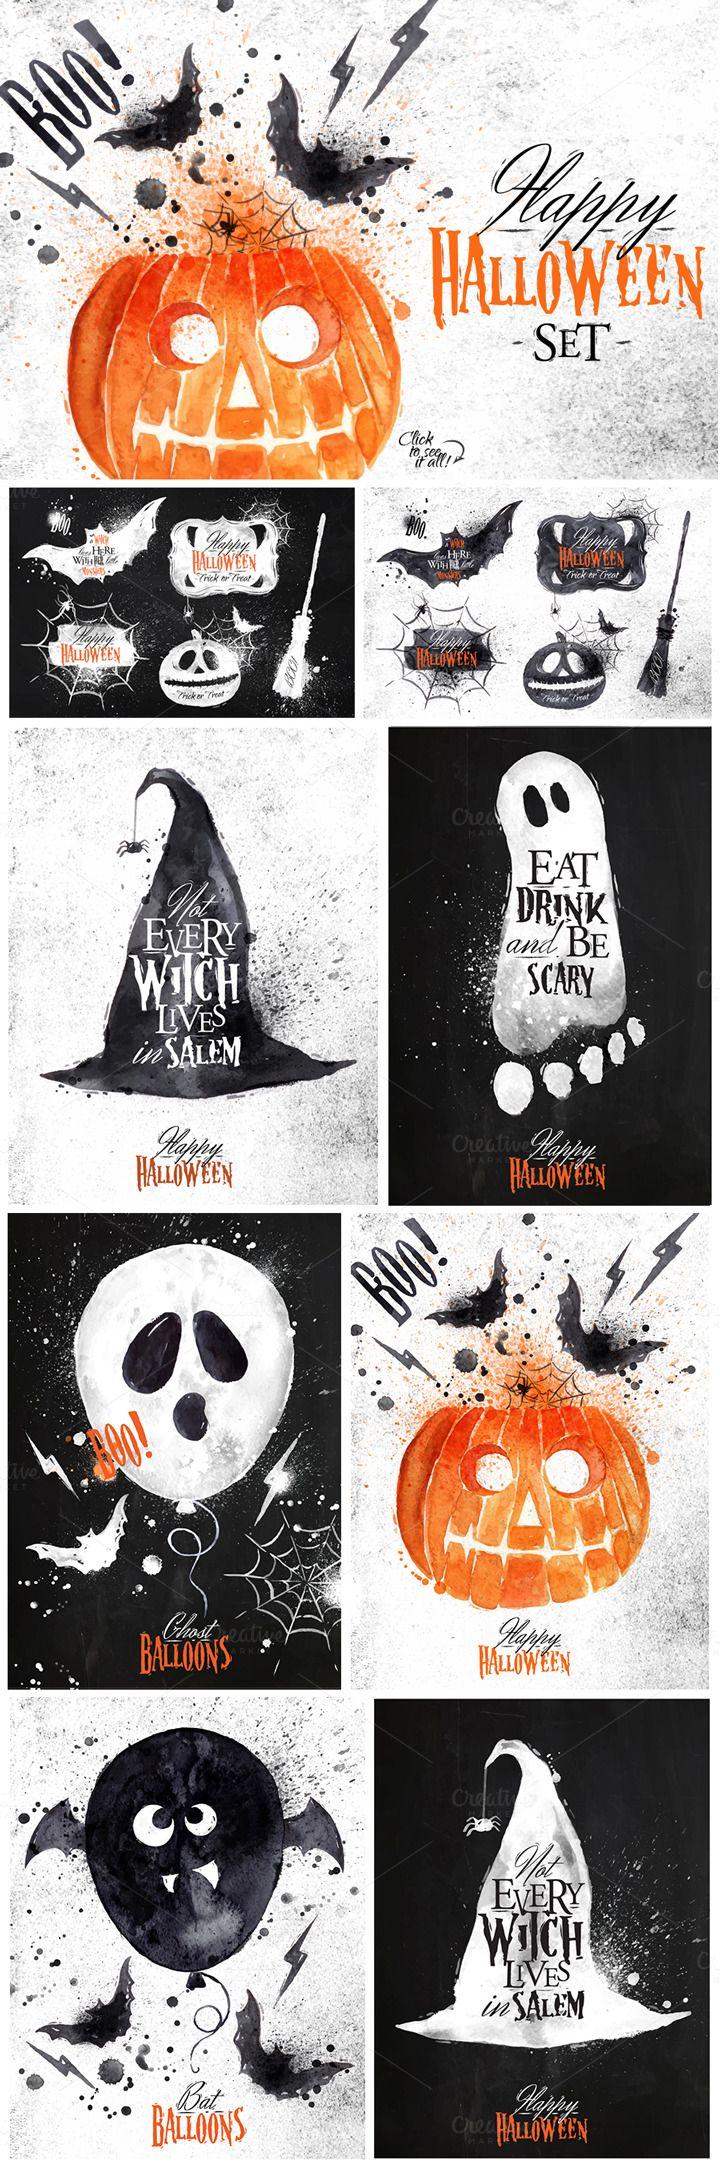 Halloween set by Anna on Creative Market